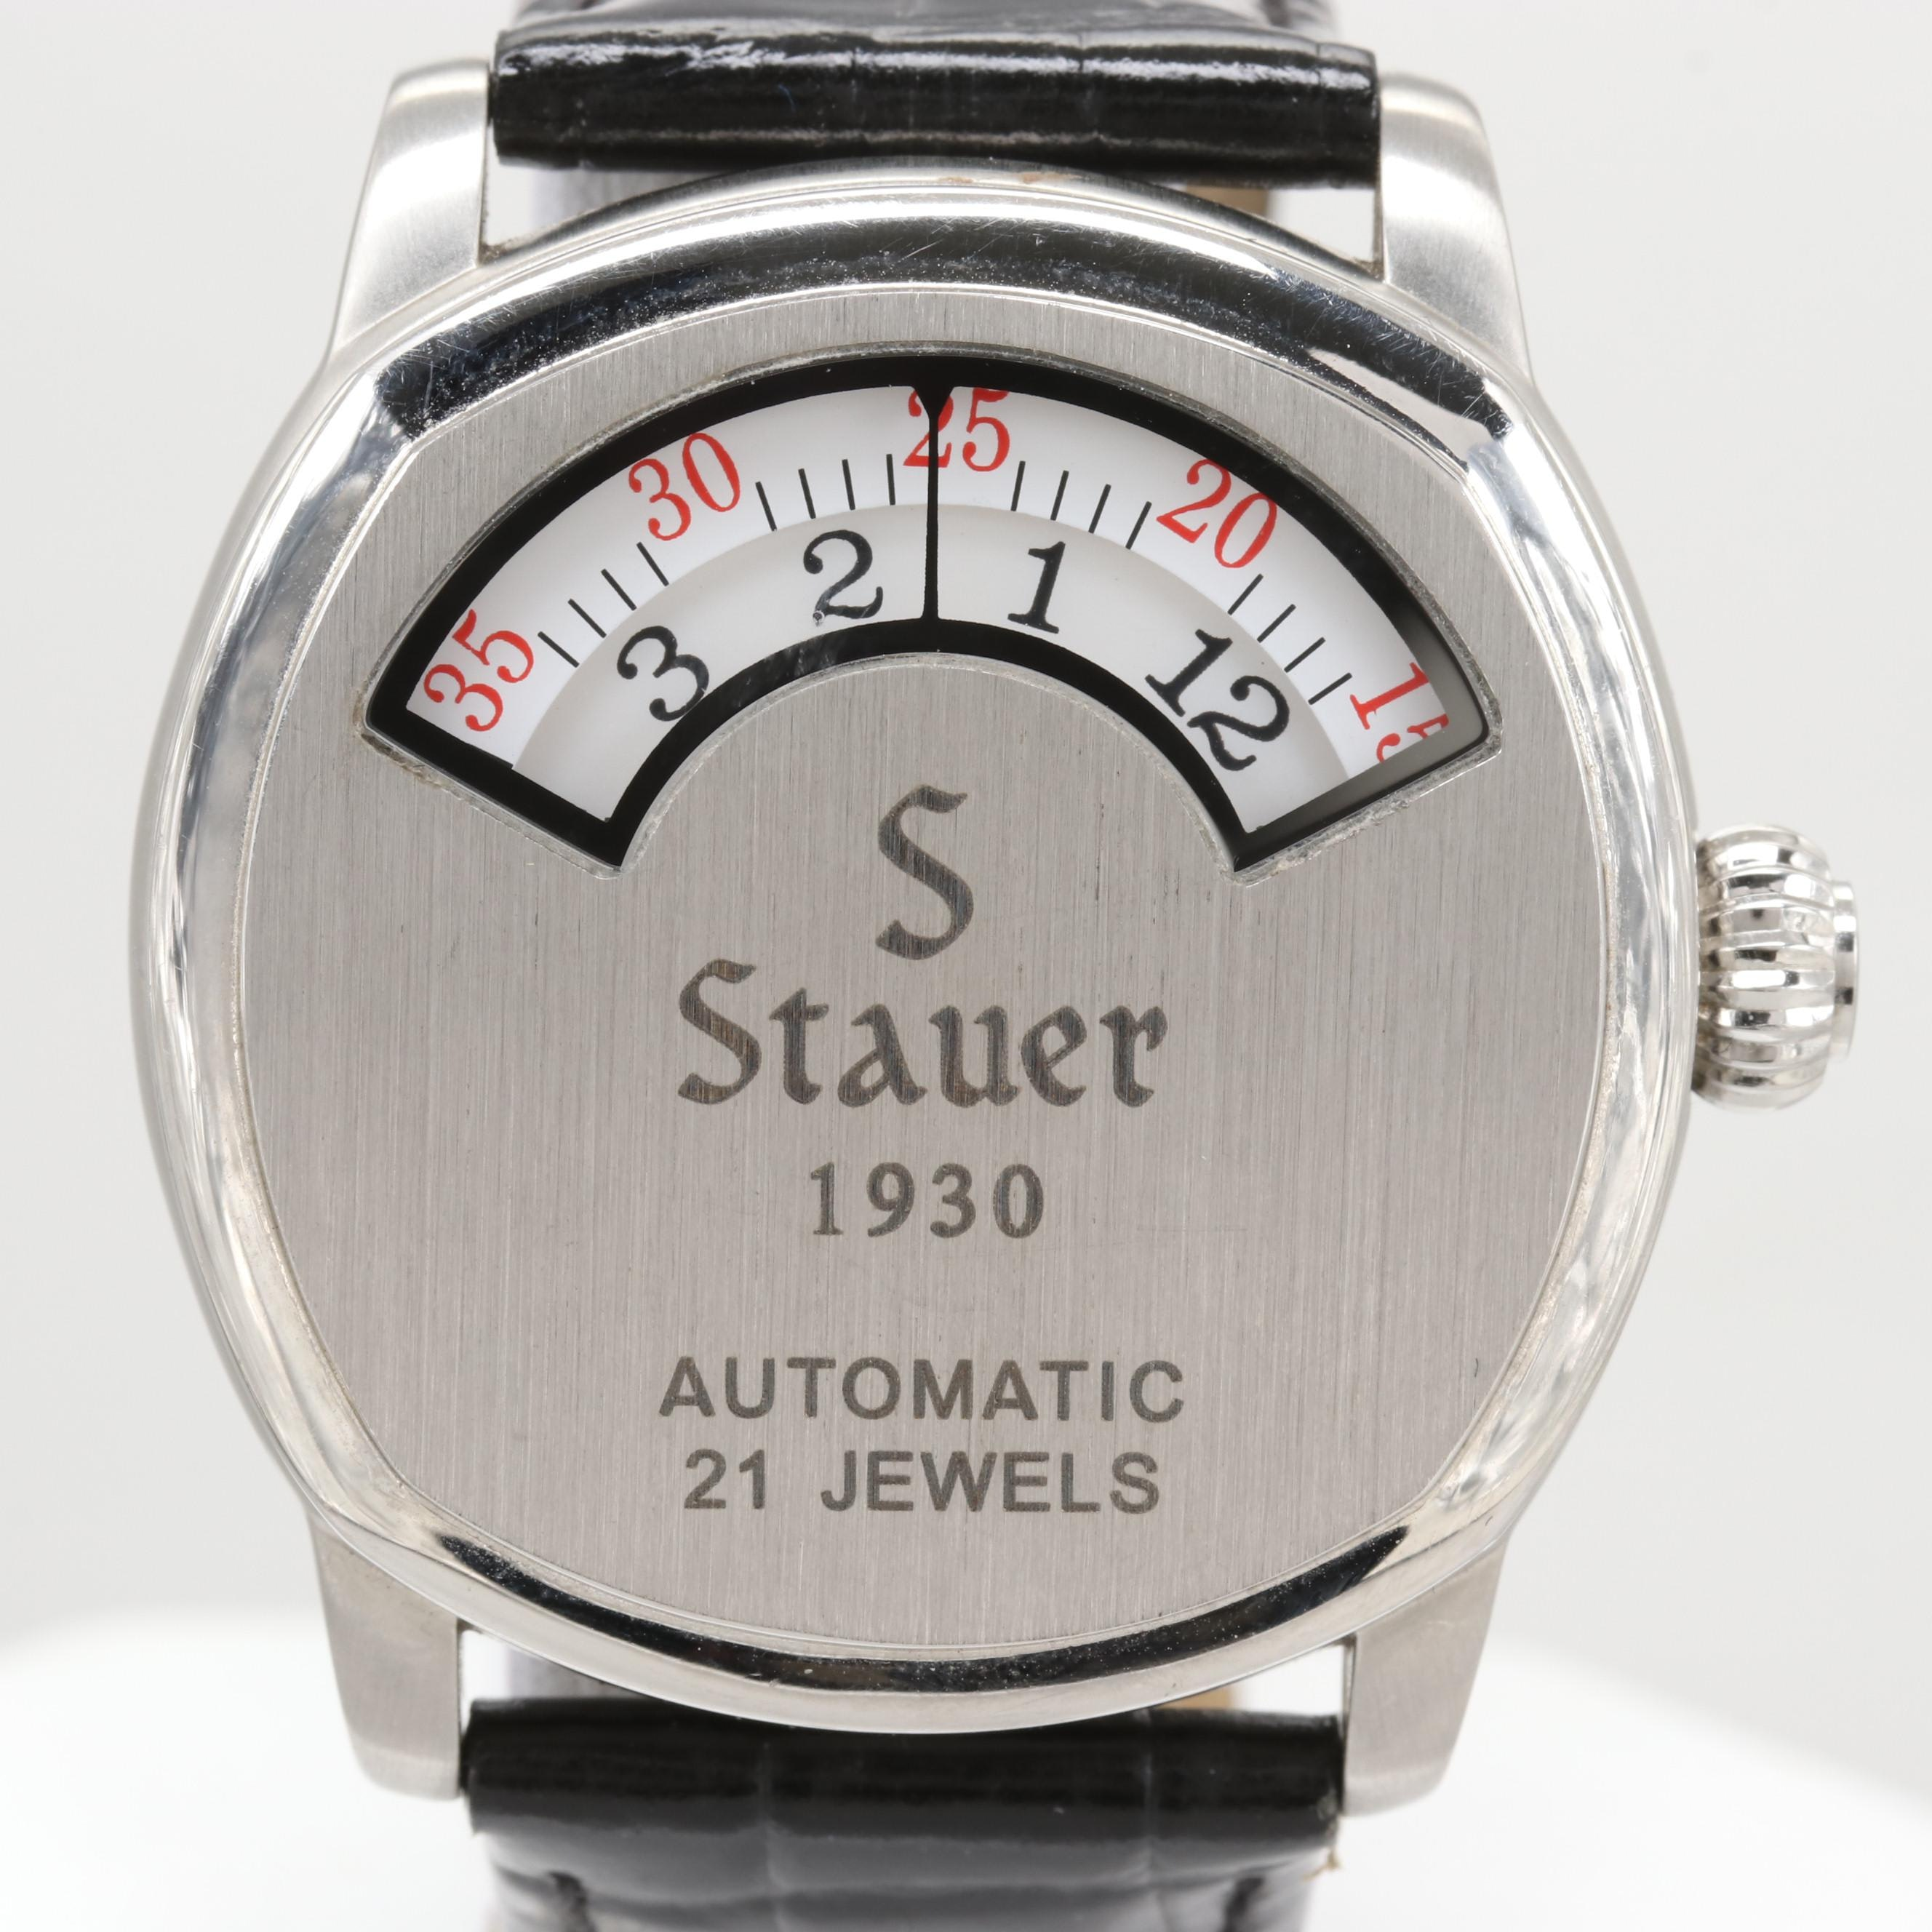 Stauer 1930 Dashtronic Stainless Steel Automatic Wristwatch